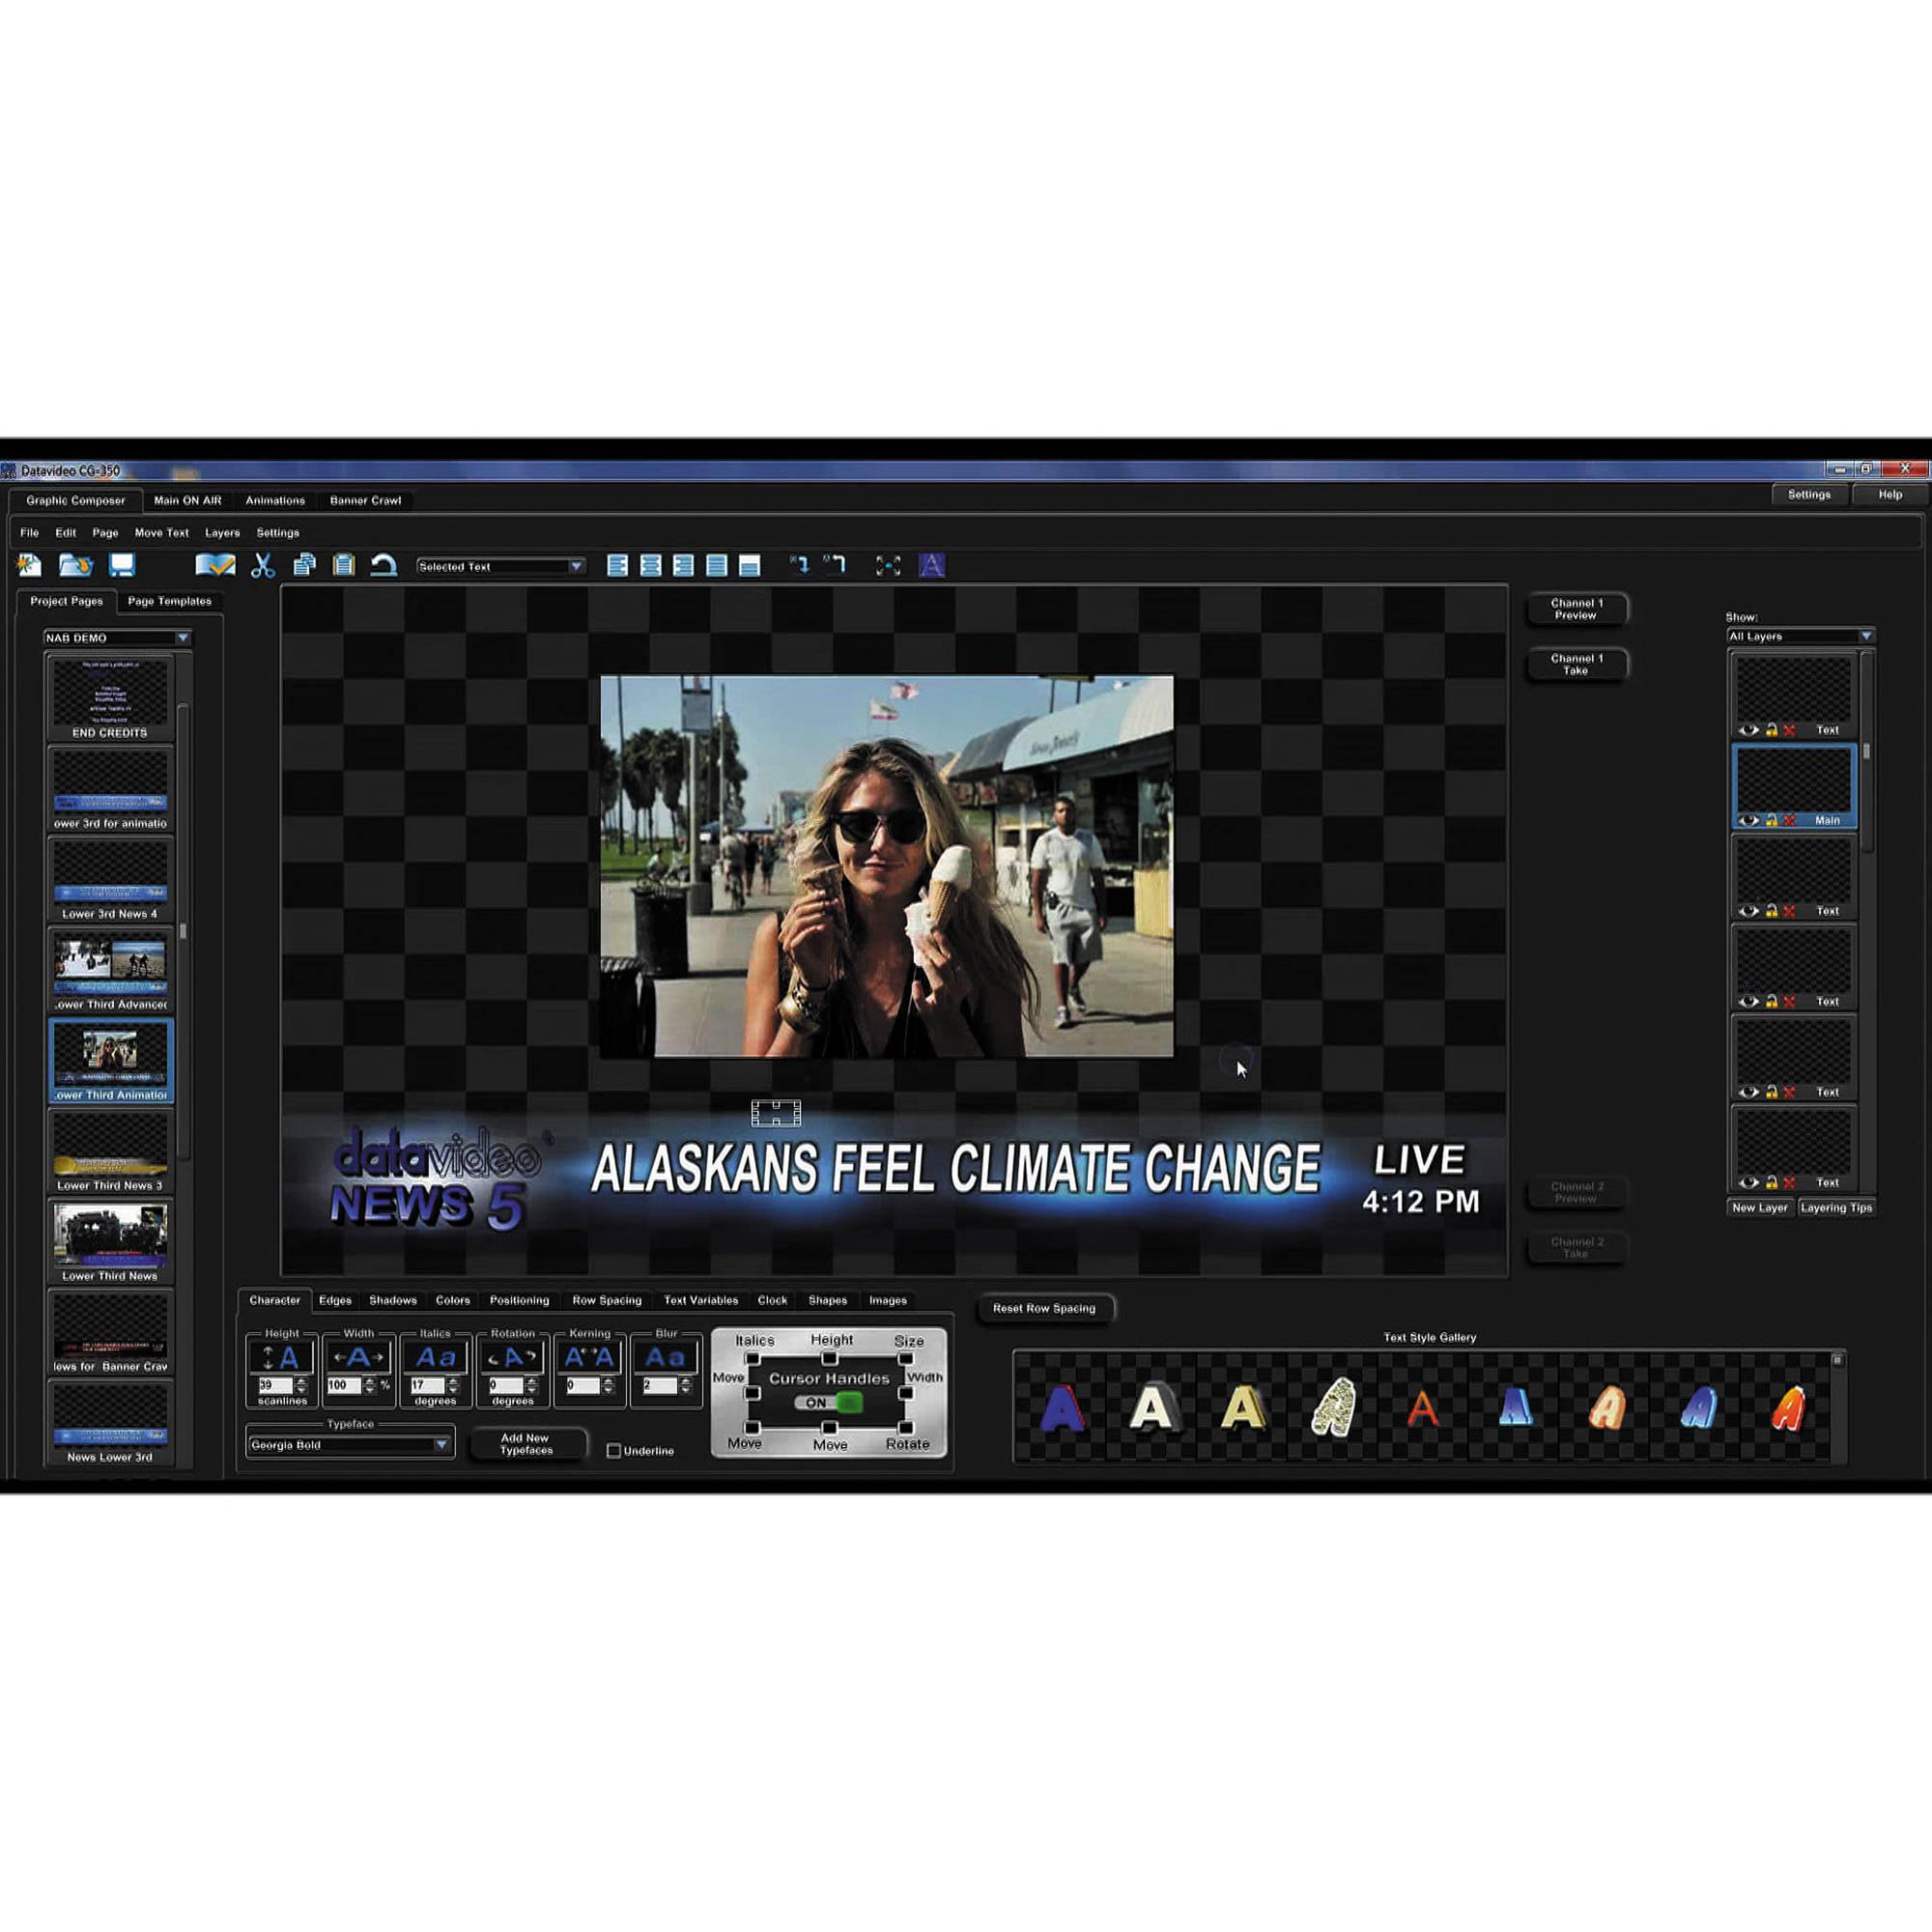 video character generator: